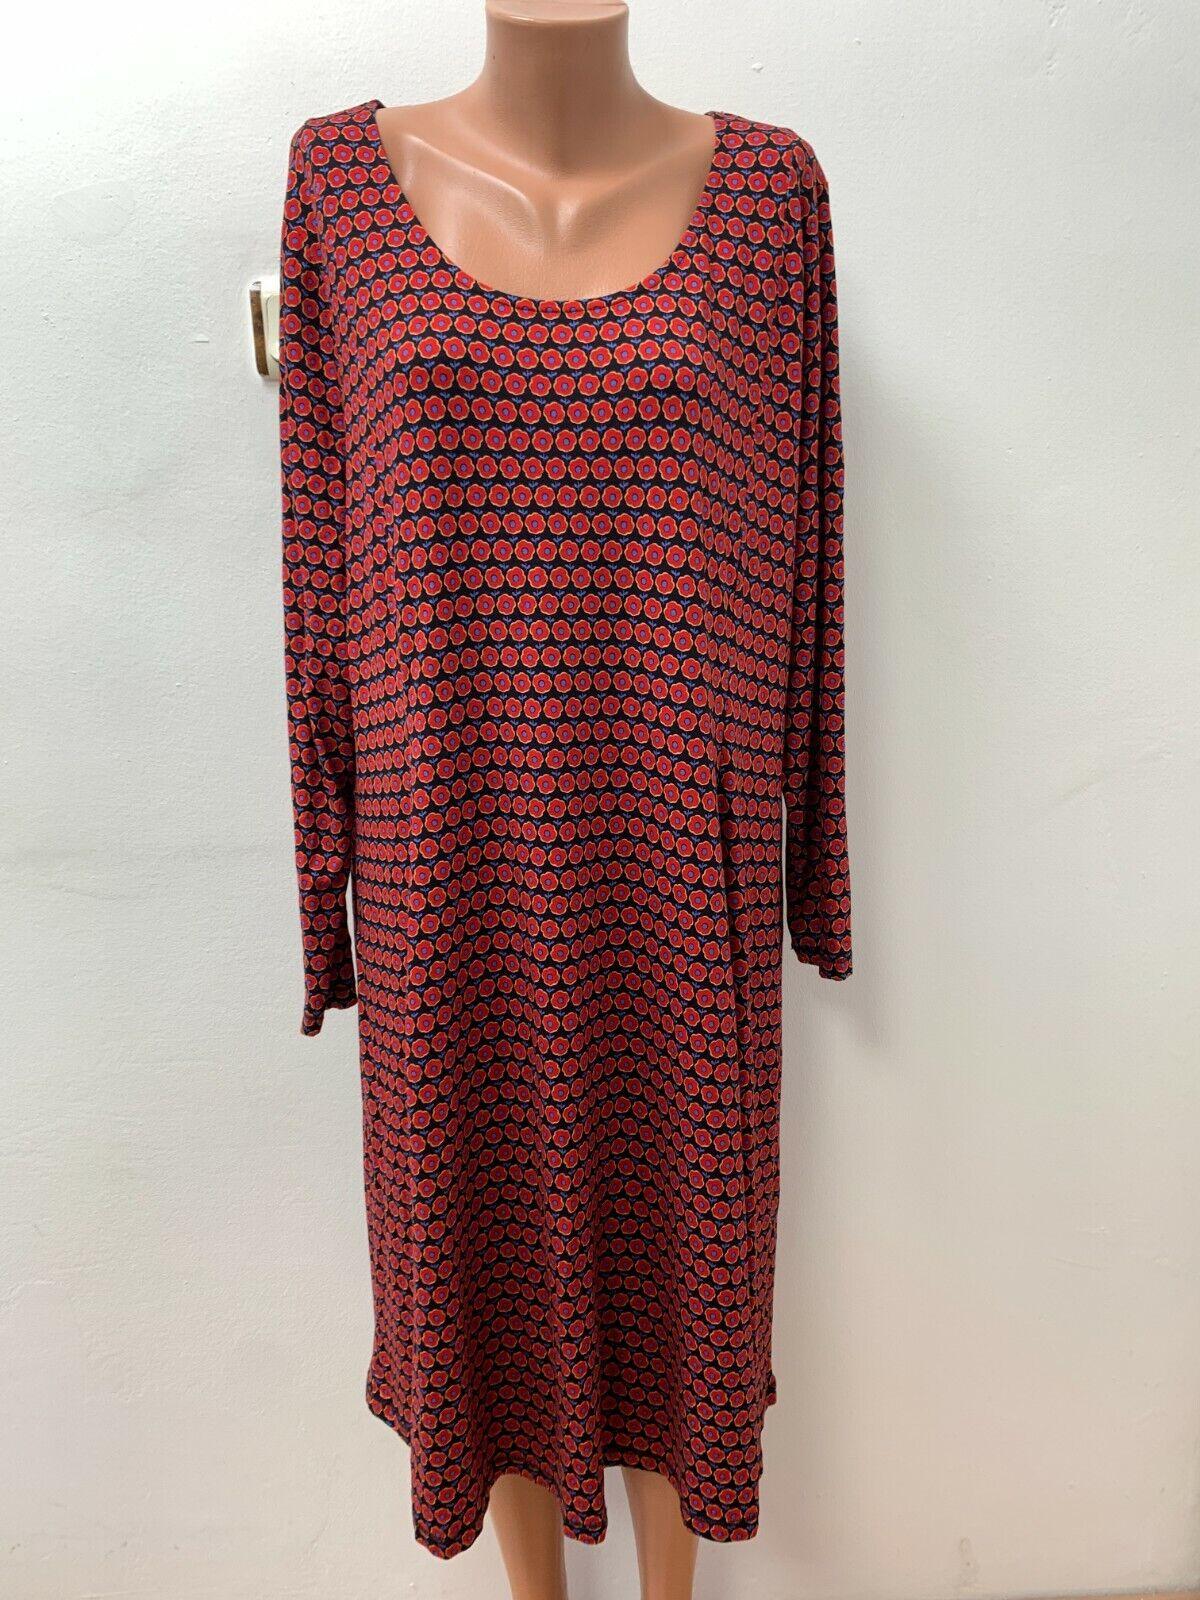 DEERBERG Gr.2XL XXL Stretch Kleid Jerseykleid Mehrfarbig geblümt Langarm Midi